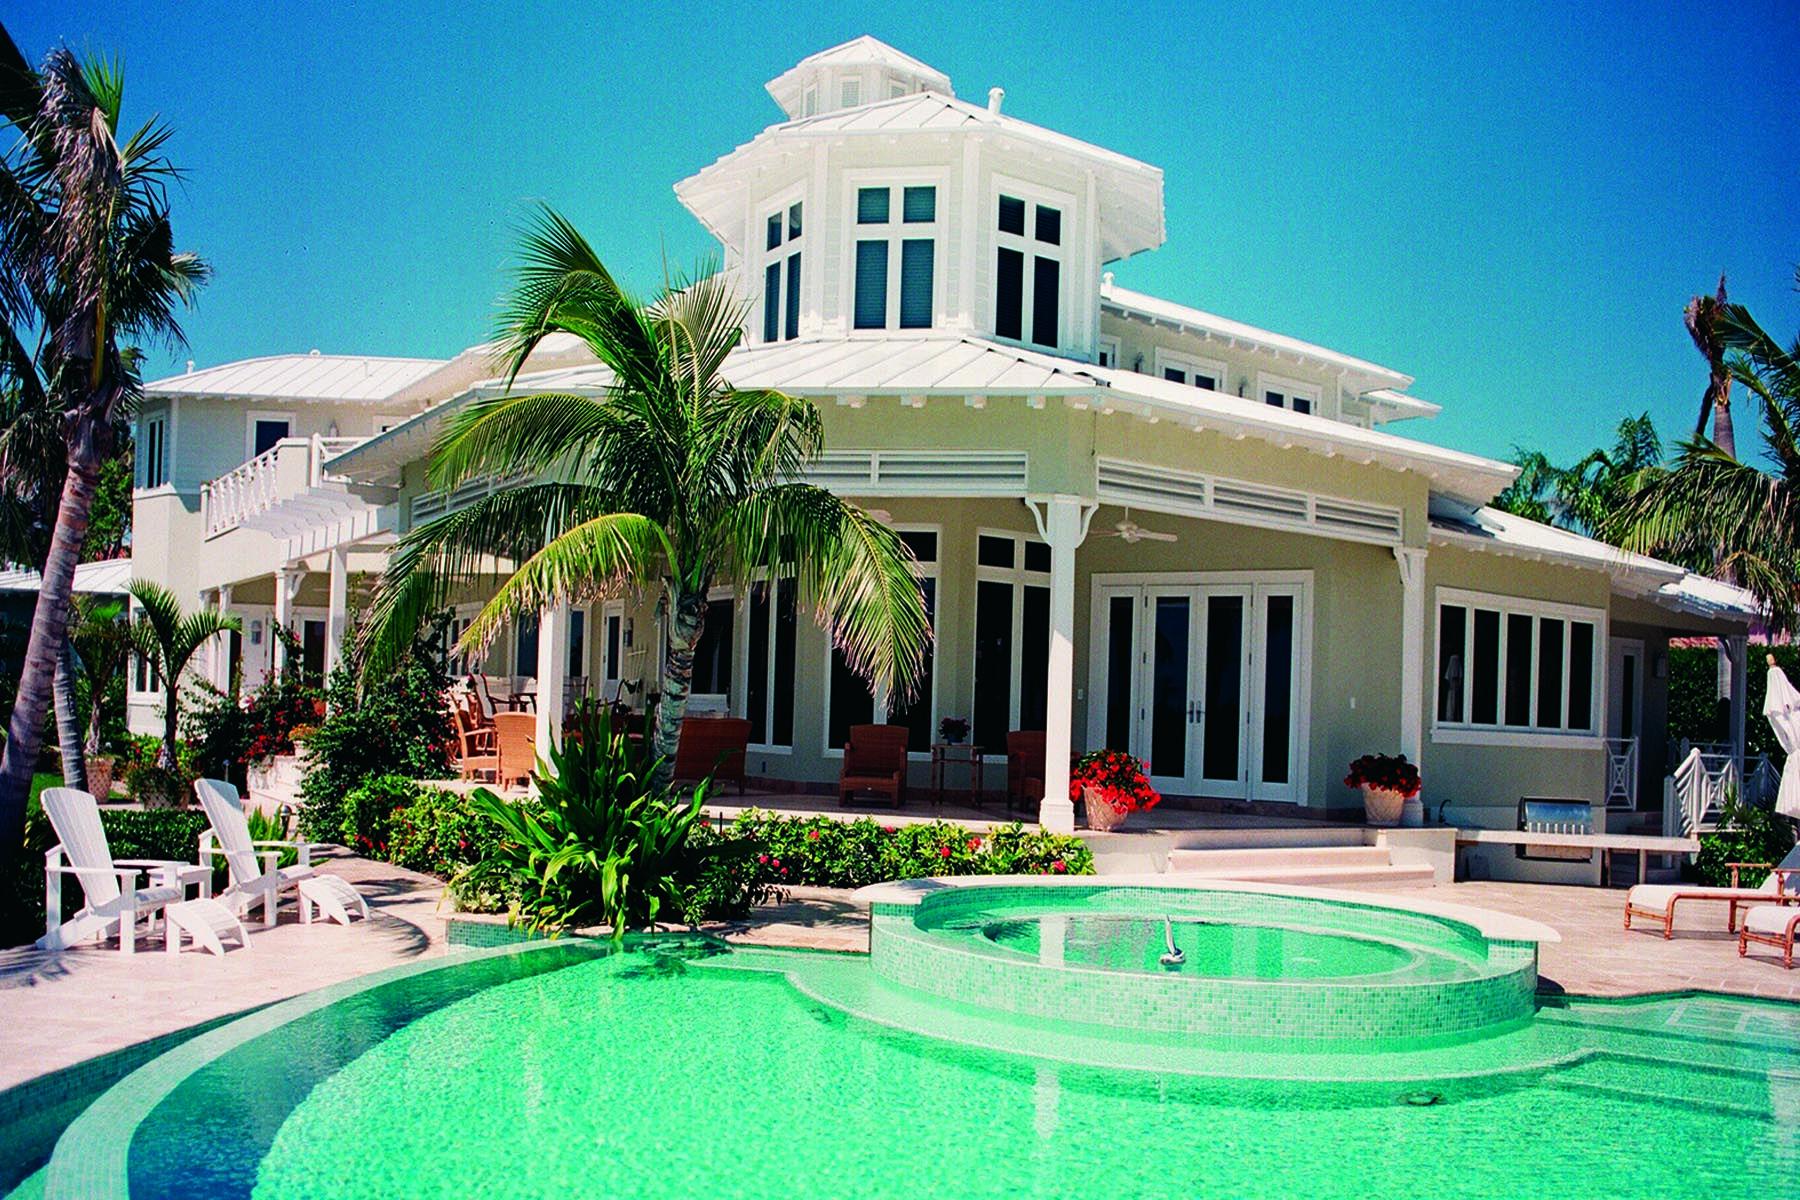 Best Drexel Metals Regal White Metal Roof Florida Keys 400 x 300